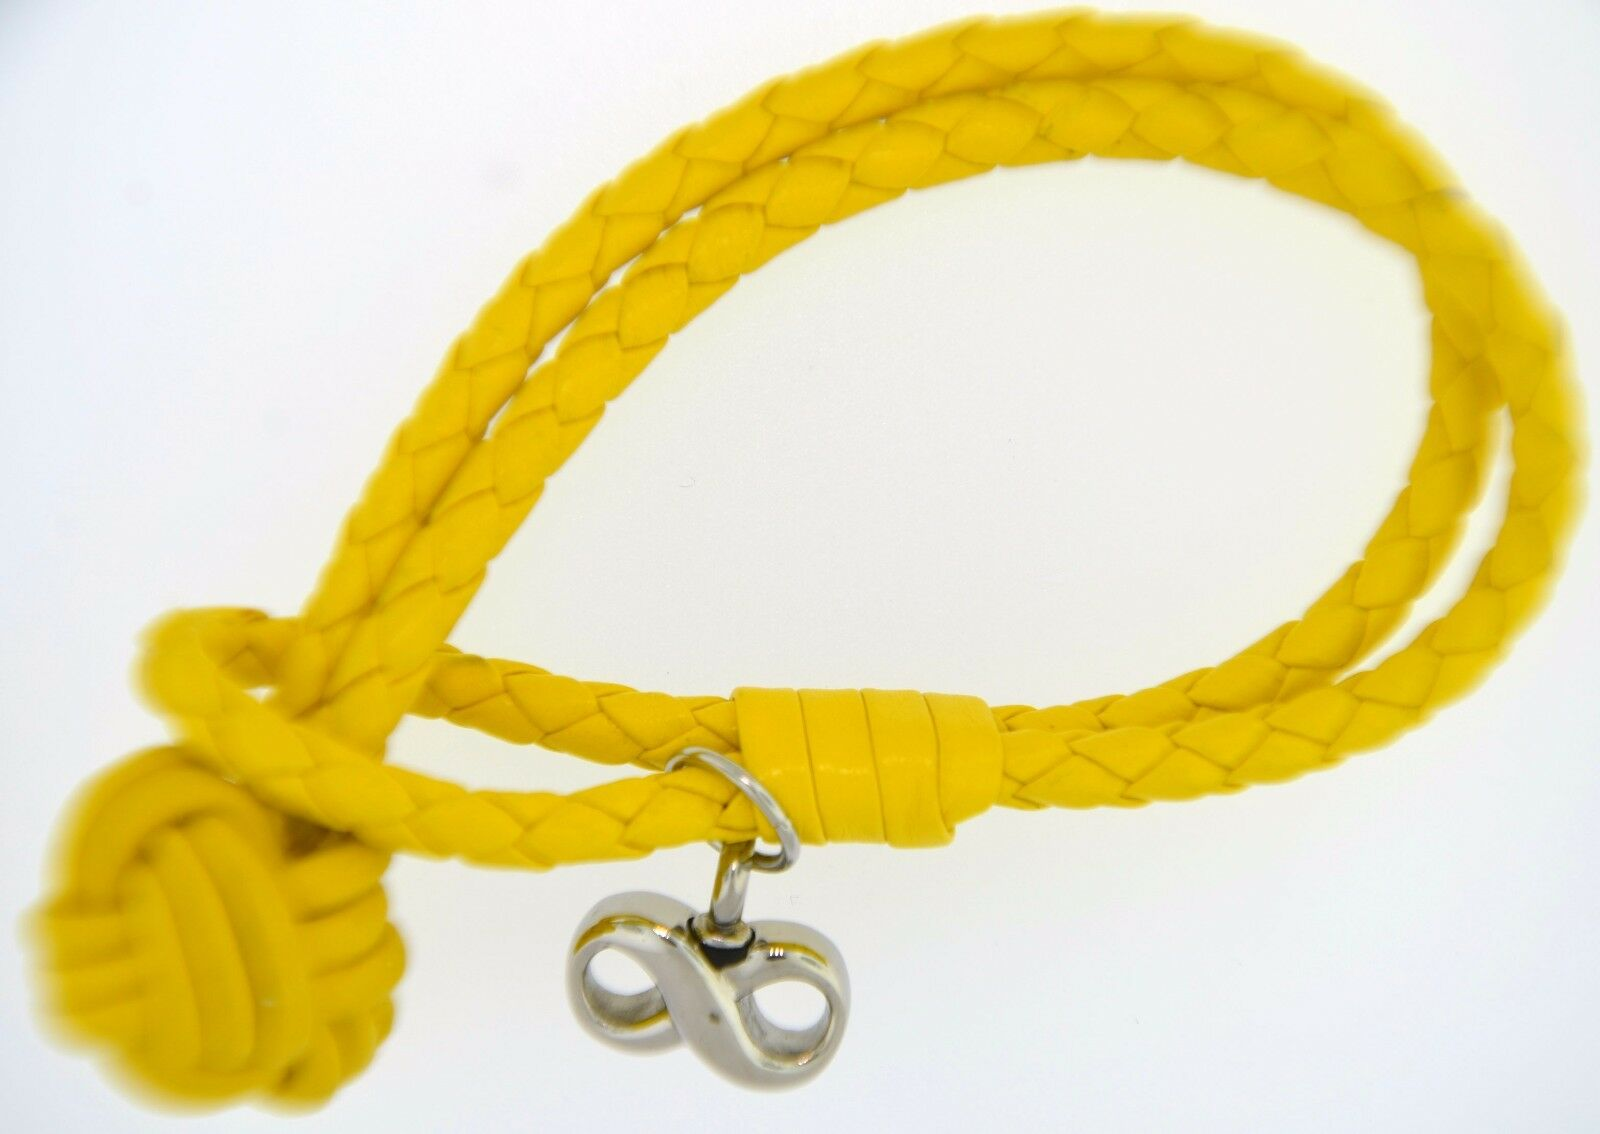 Amarillo Trenzado Pulsera con Joyas para Cremación Urna Recuerdo Infinito Colgante